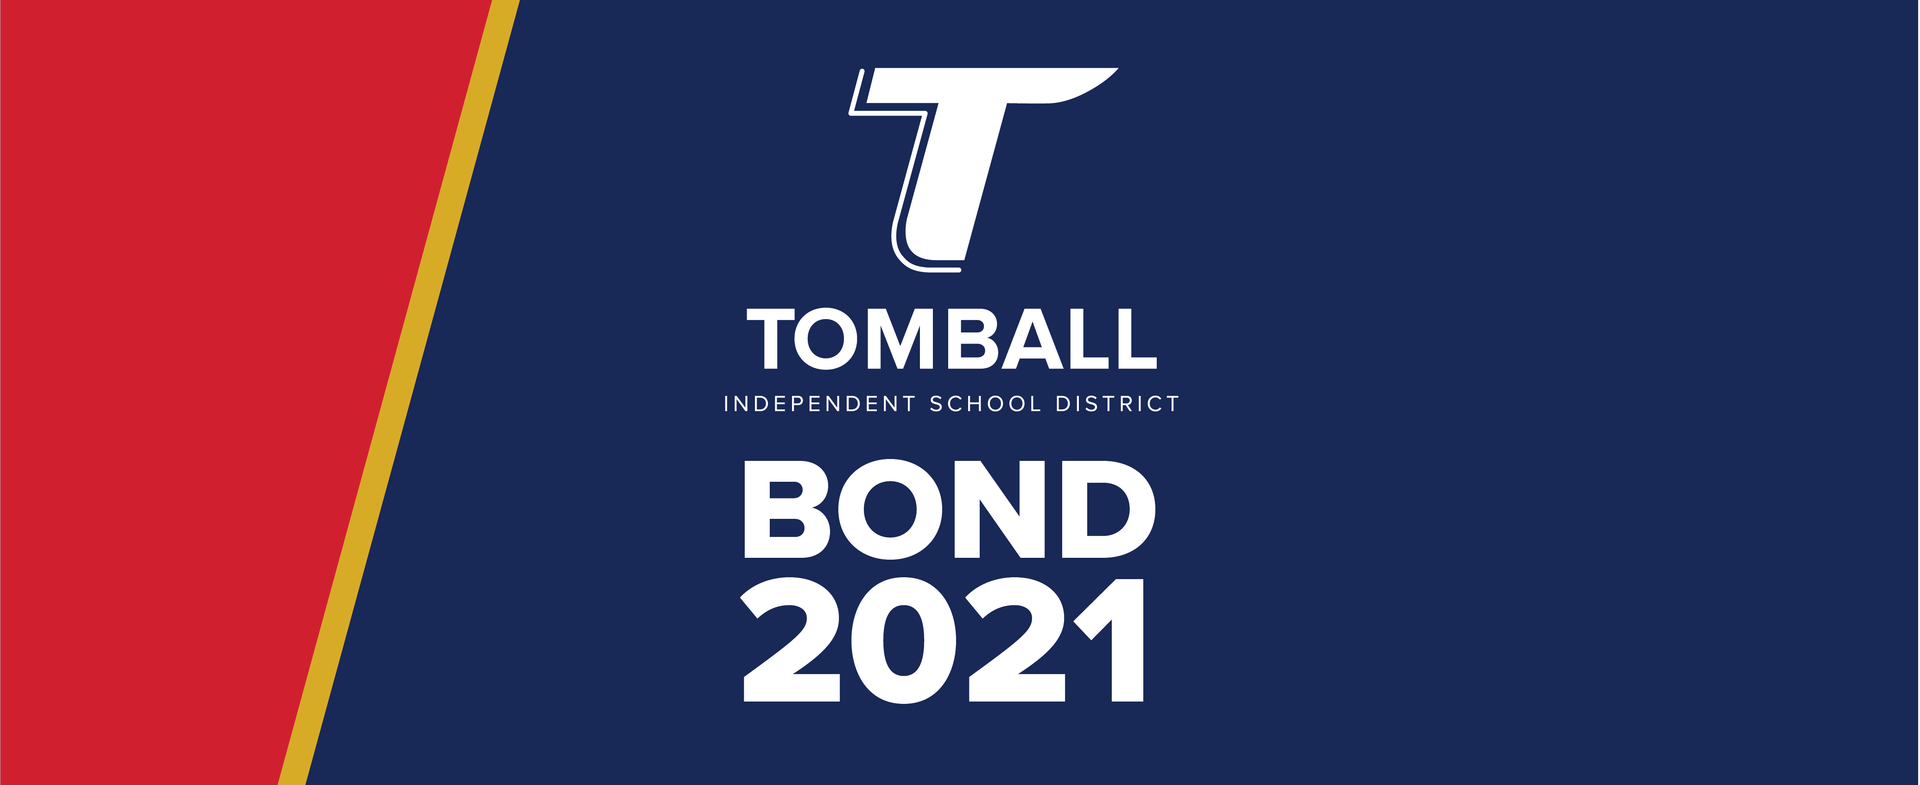 Tomball Independent School District Bond 2021